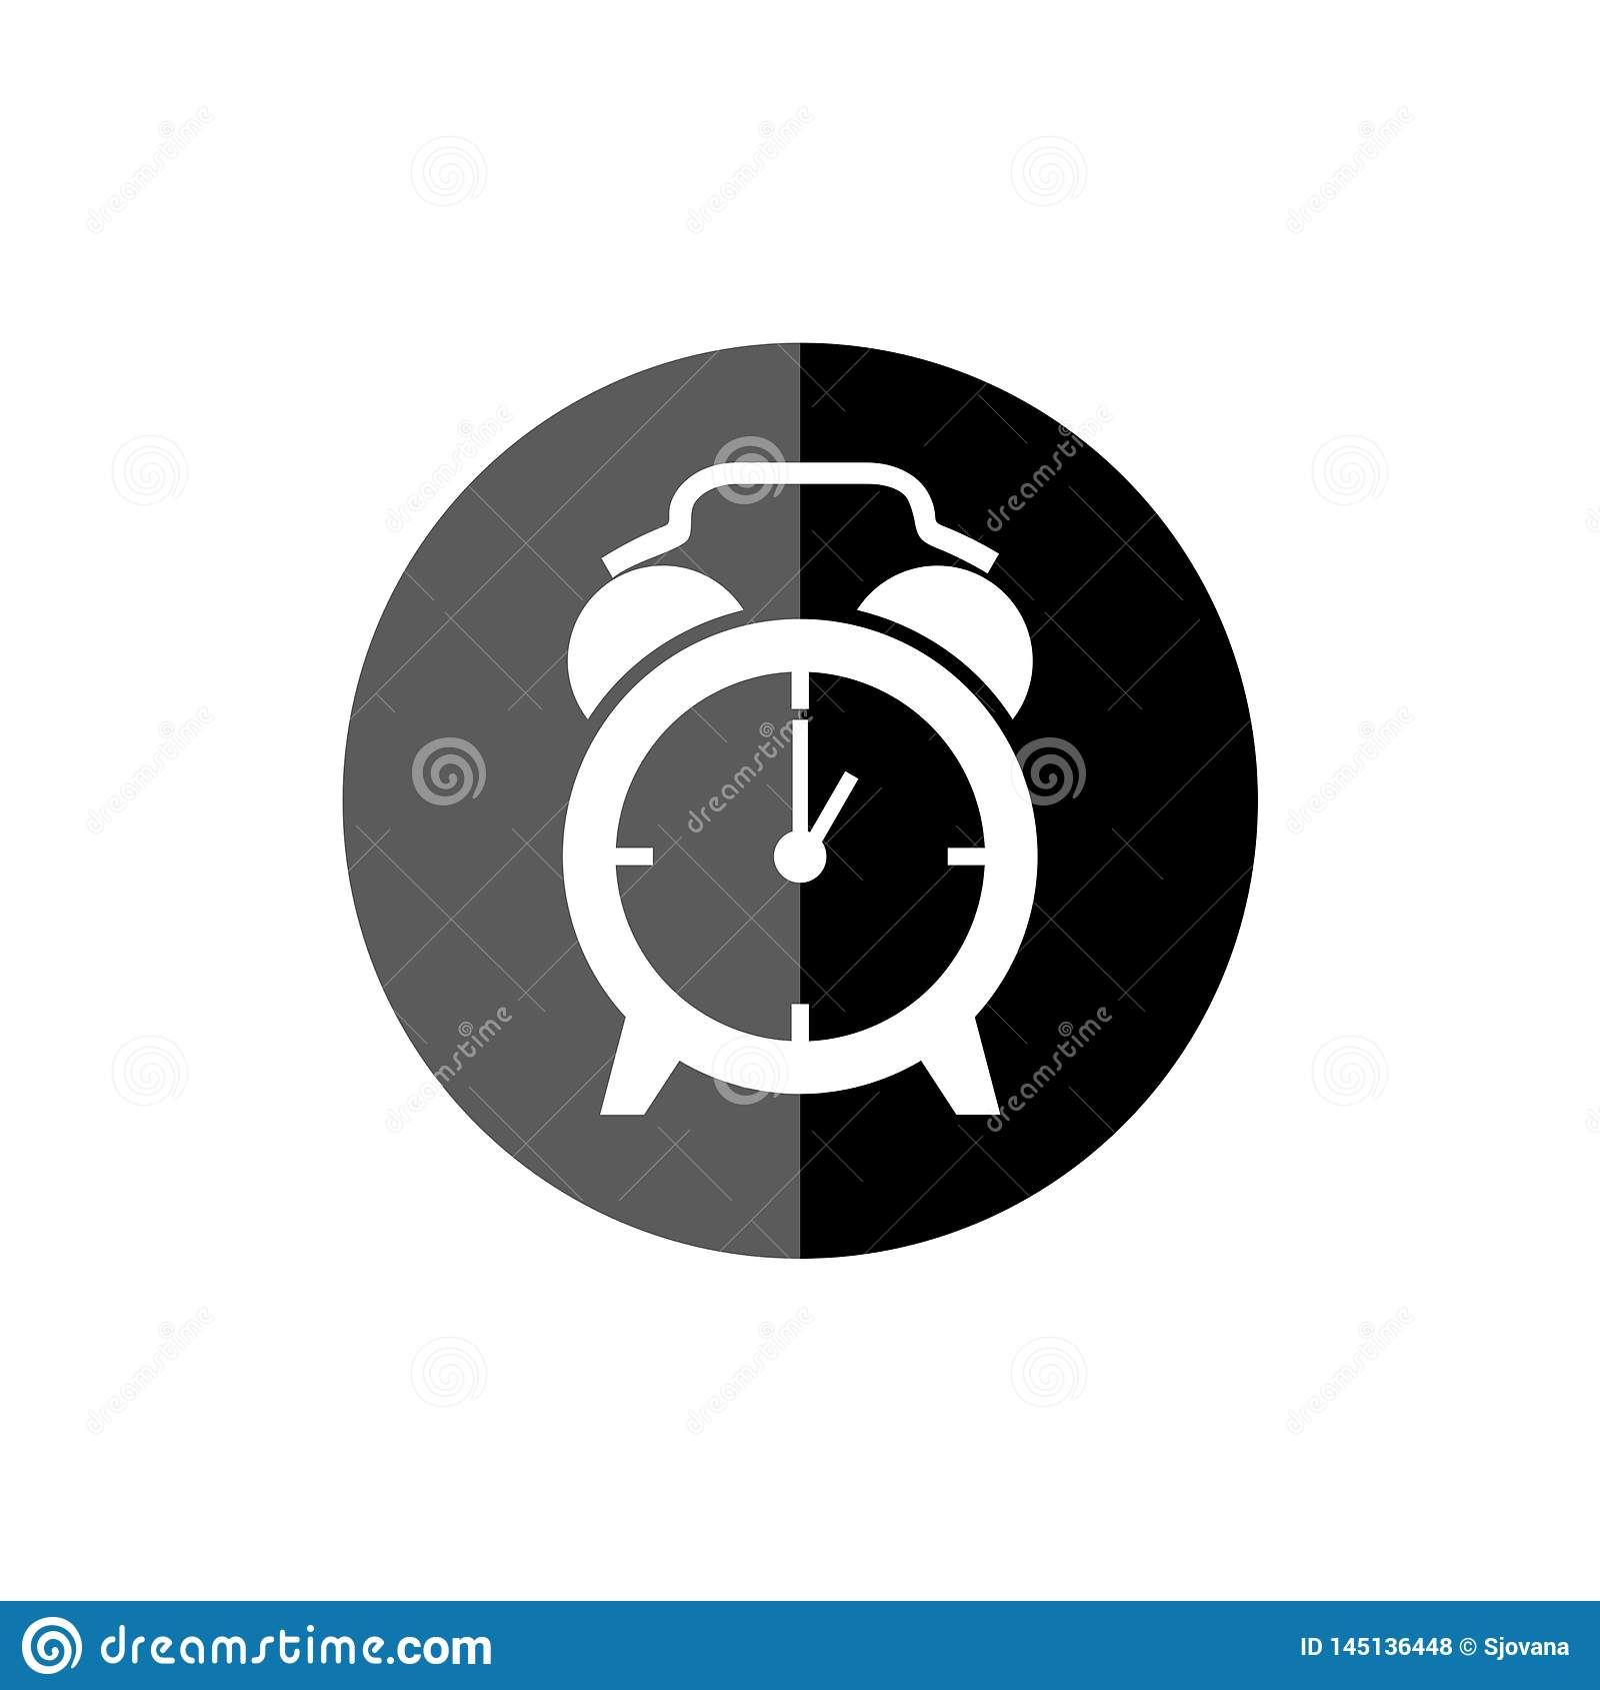 Clock Face Logo Images, Stock Photos & Vectors   Shutterstock